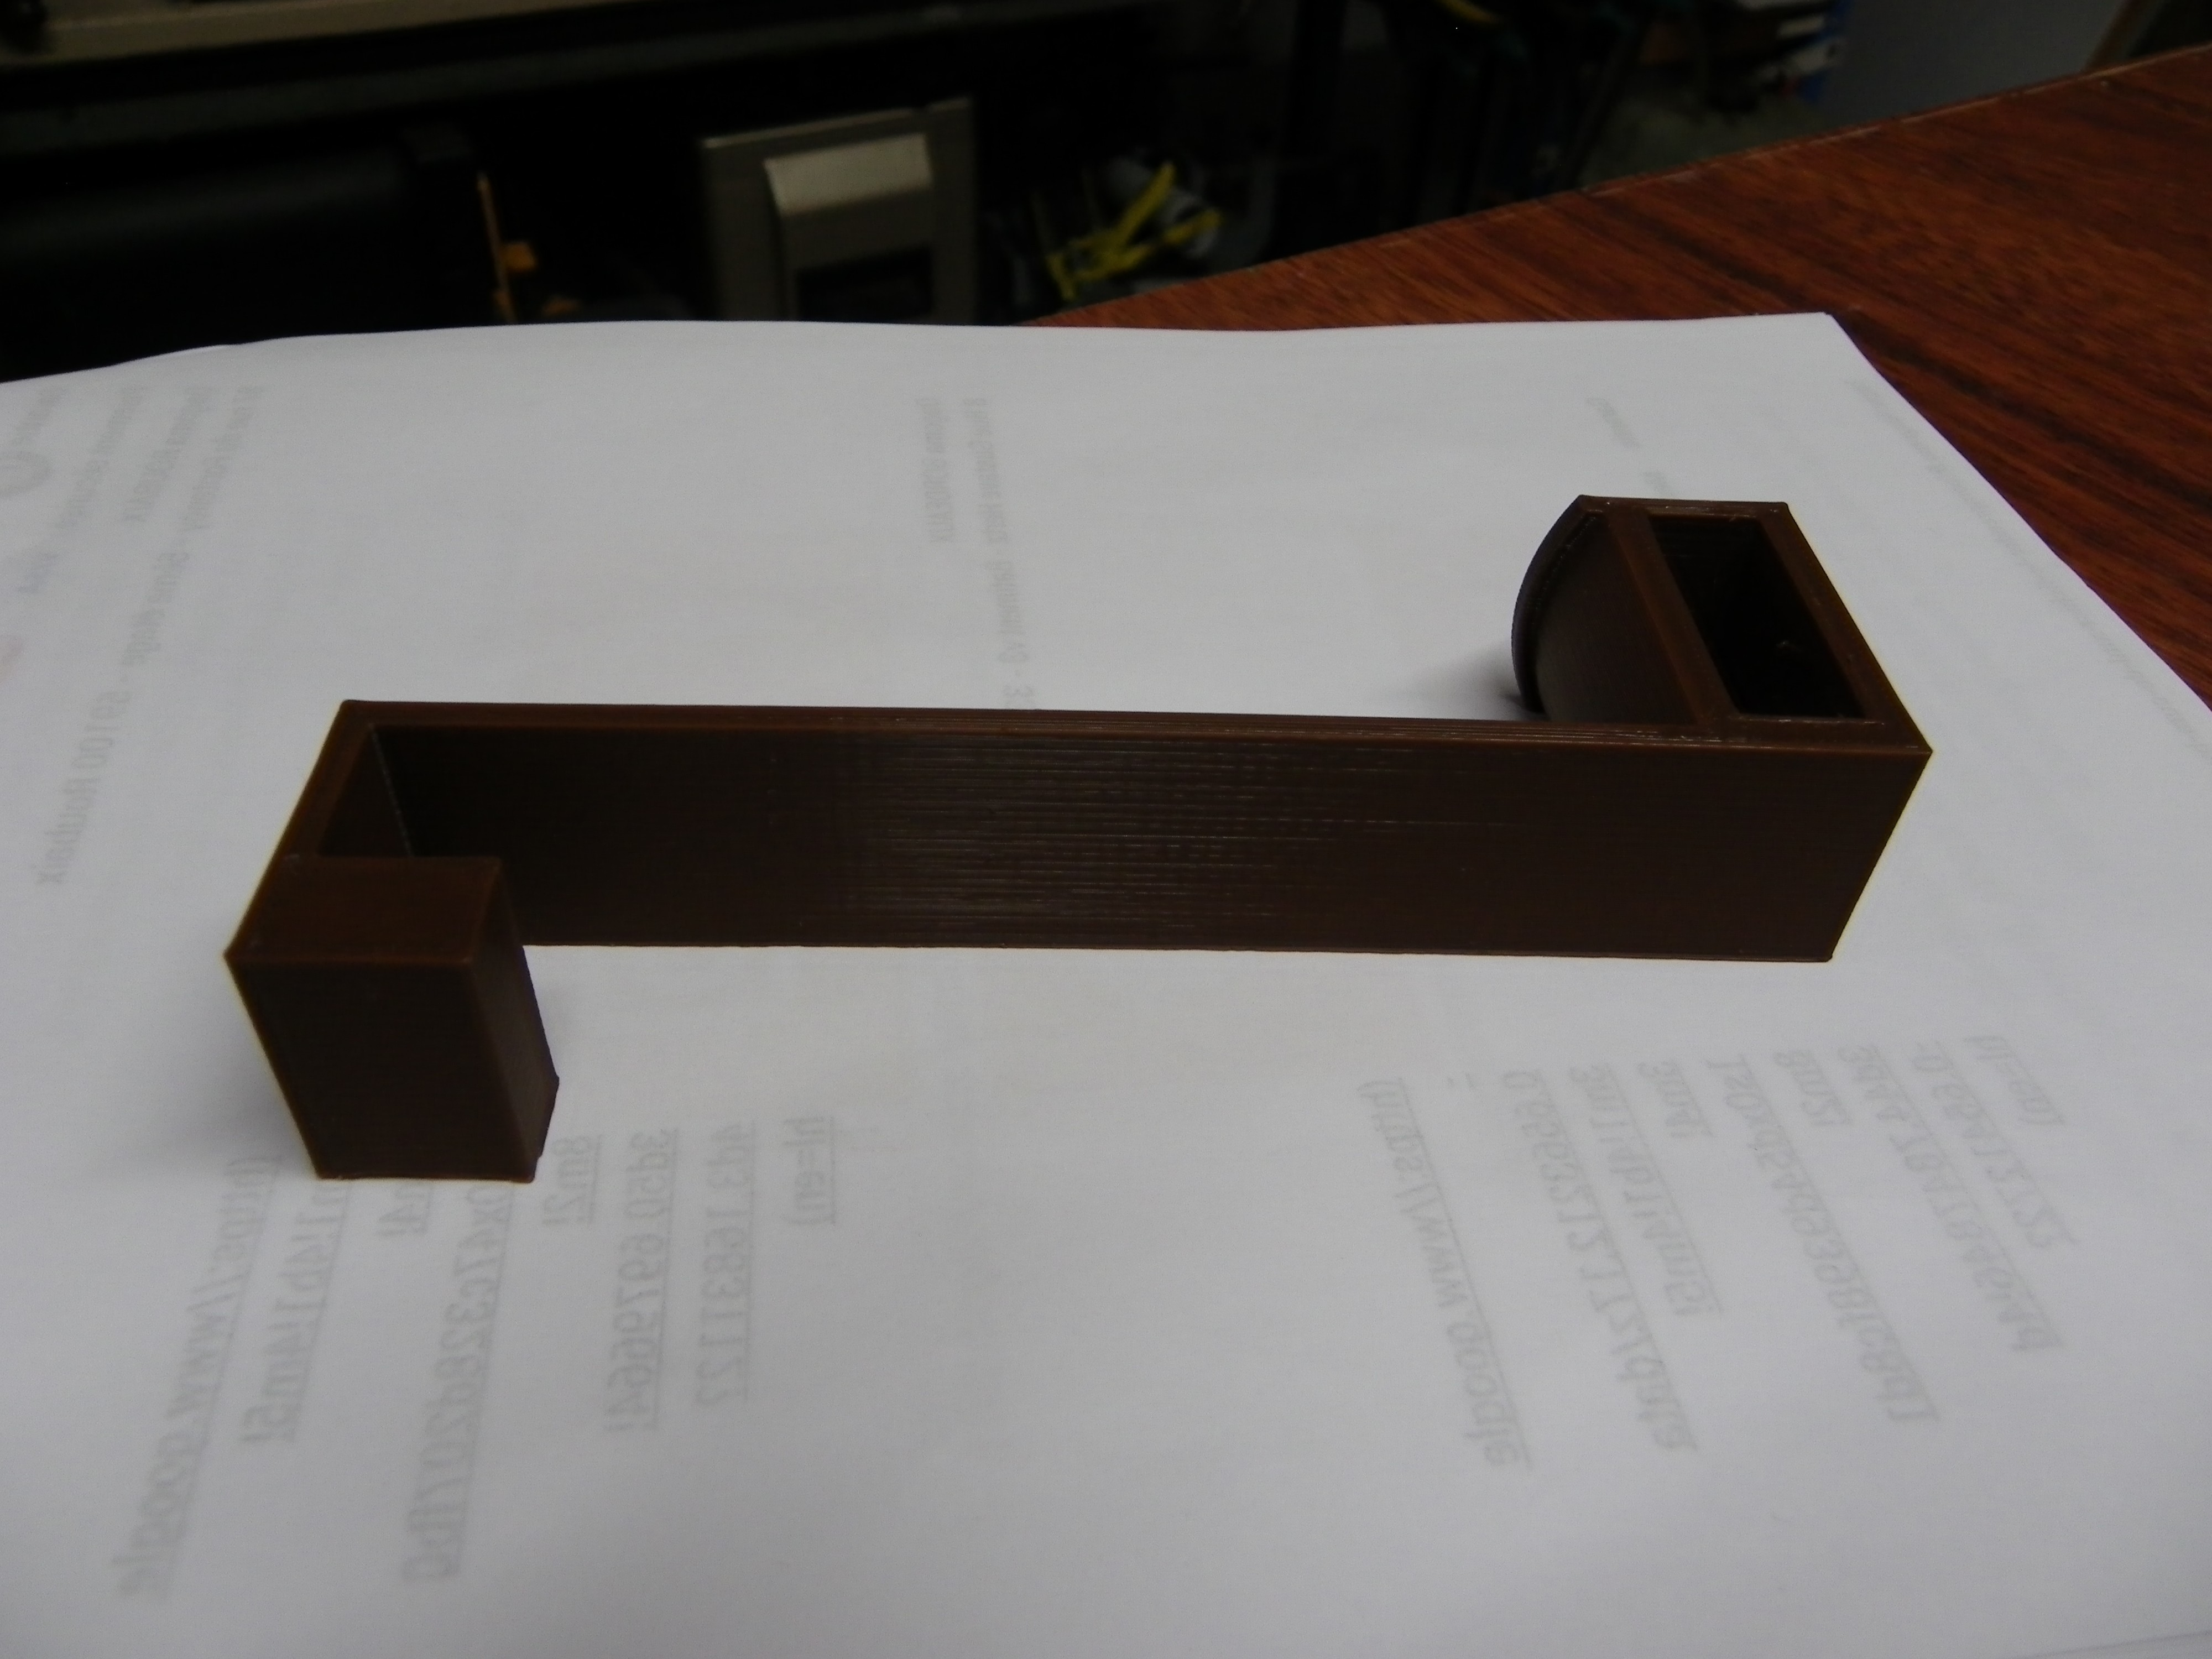 support bobine 01.JPG Download STL file reel stand for DA VINCI 1.0 pro • 3D printer template, bucker